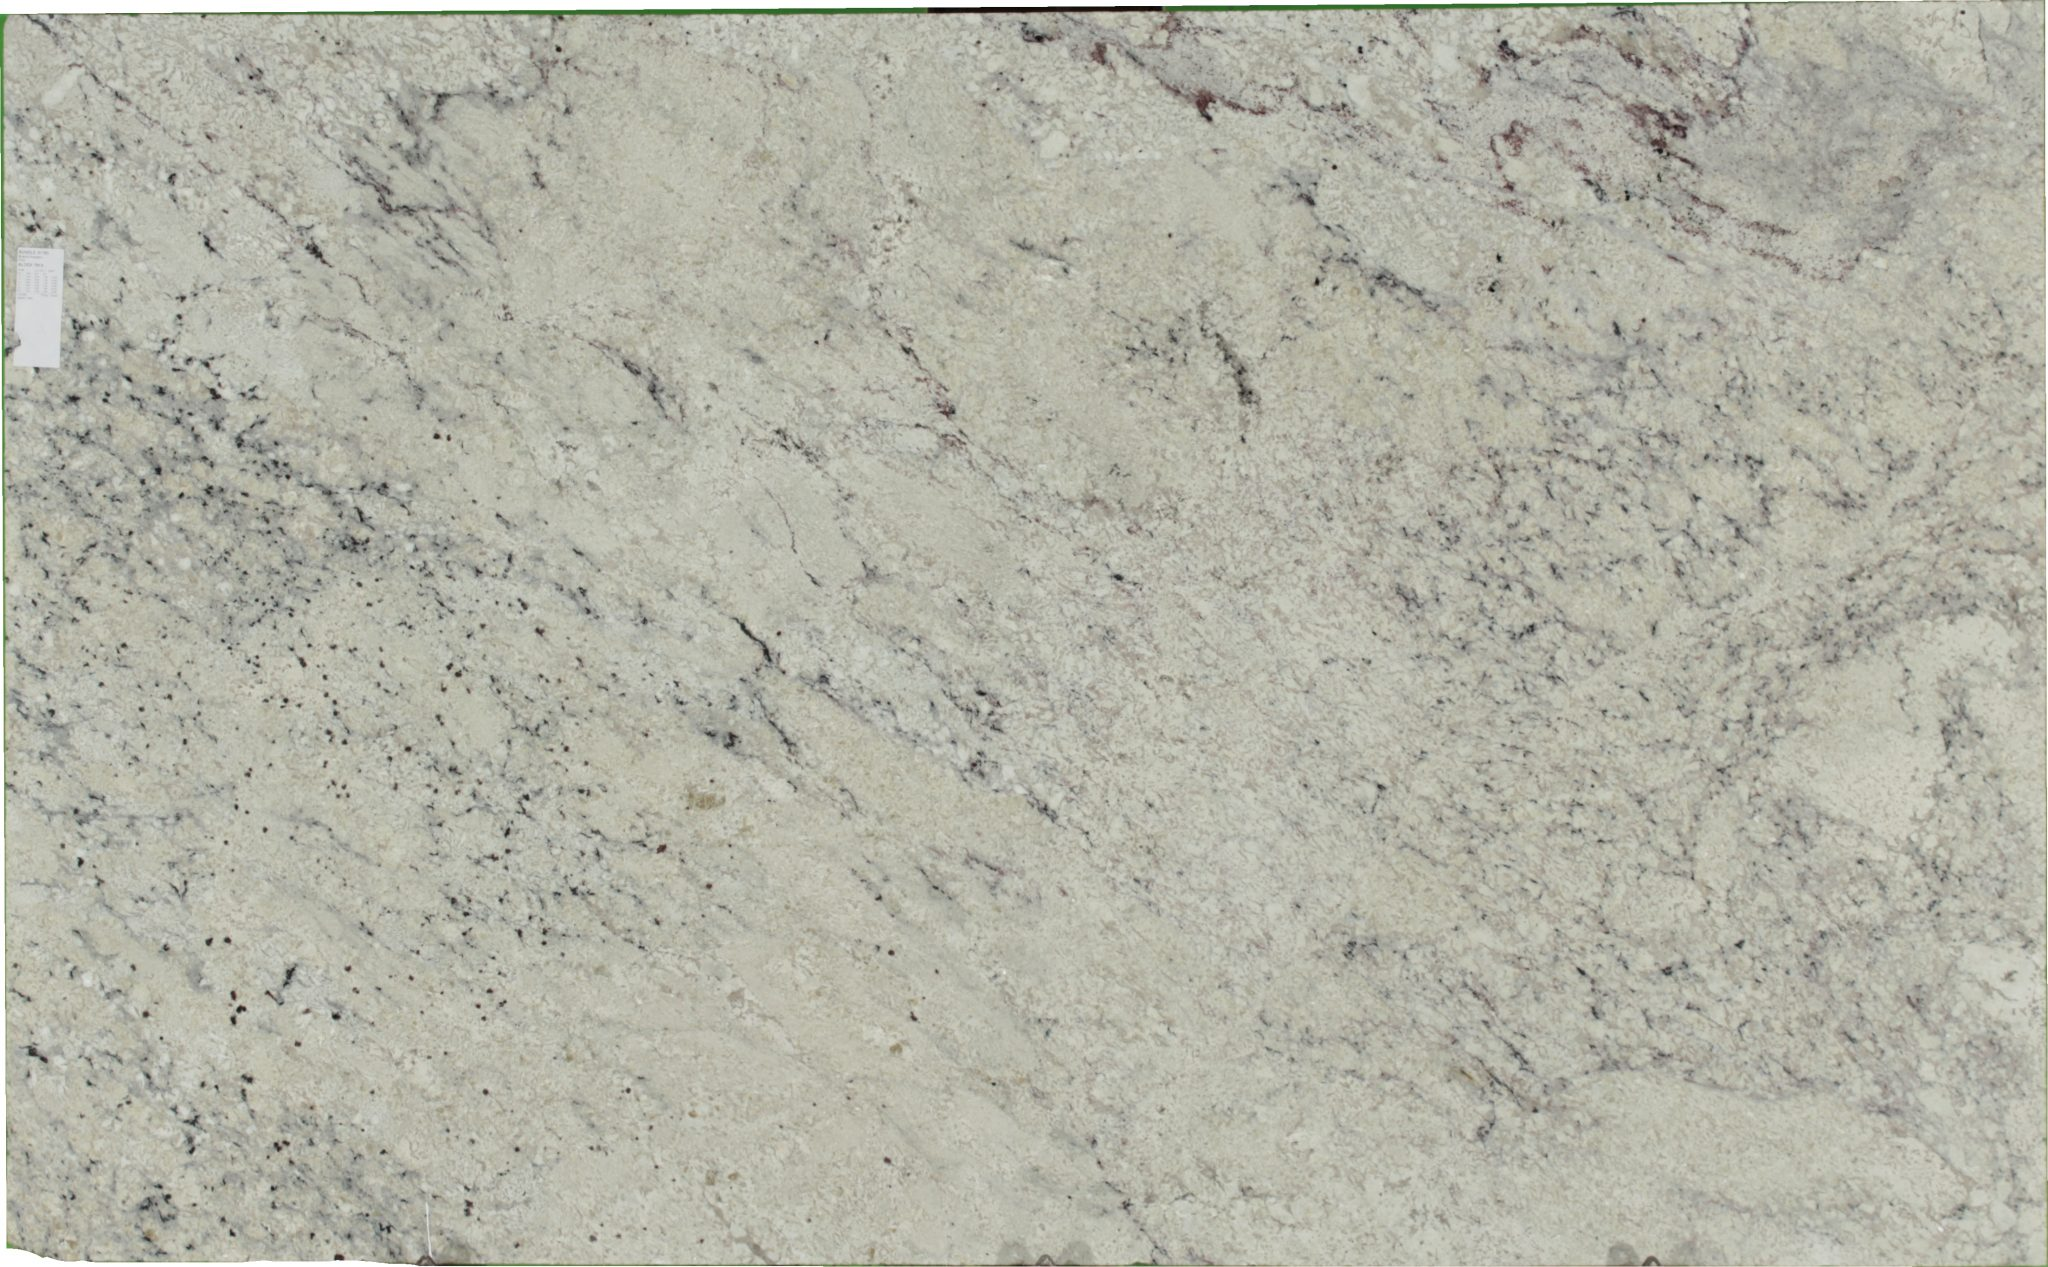 Sturdy Image Granite Bianco Romano Bianco Romano Granite Counter Solutions Slab Inventory Bianco Romano Granite Slab Bianco Romano Granite Kitchen houzz 01 Bianco Romano Granite